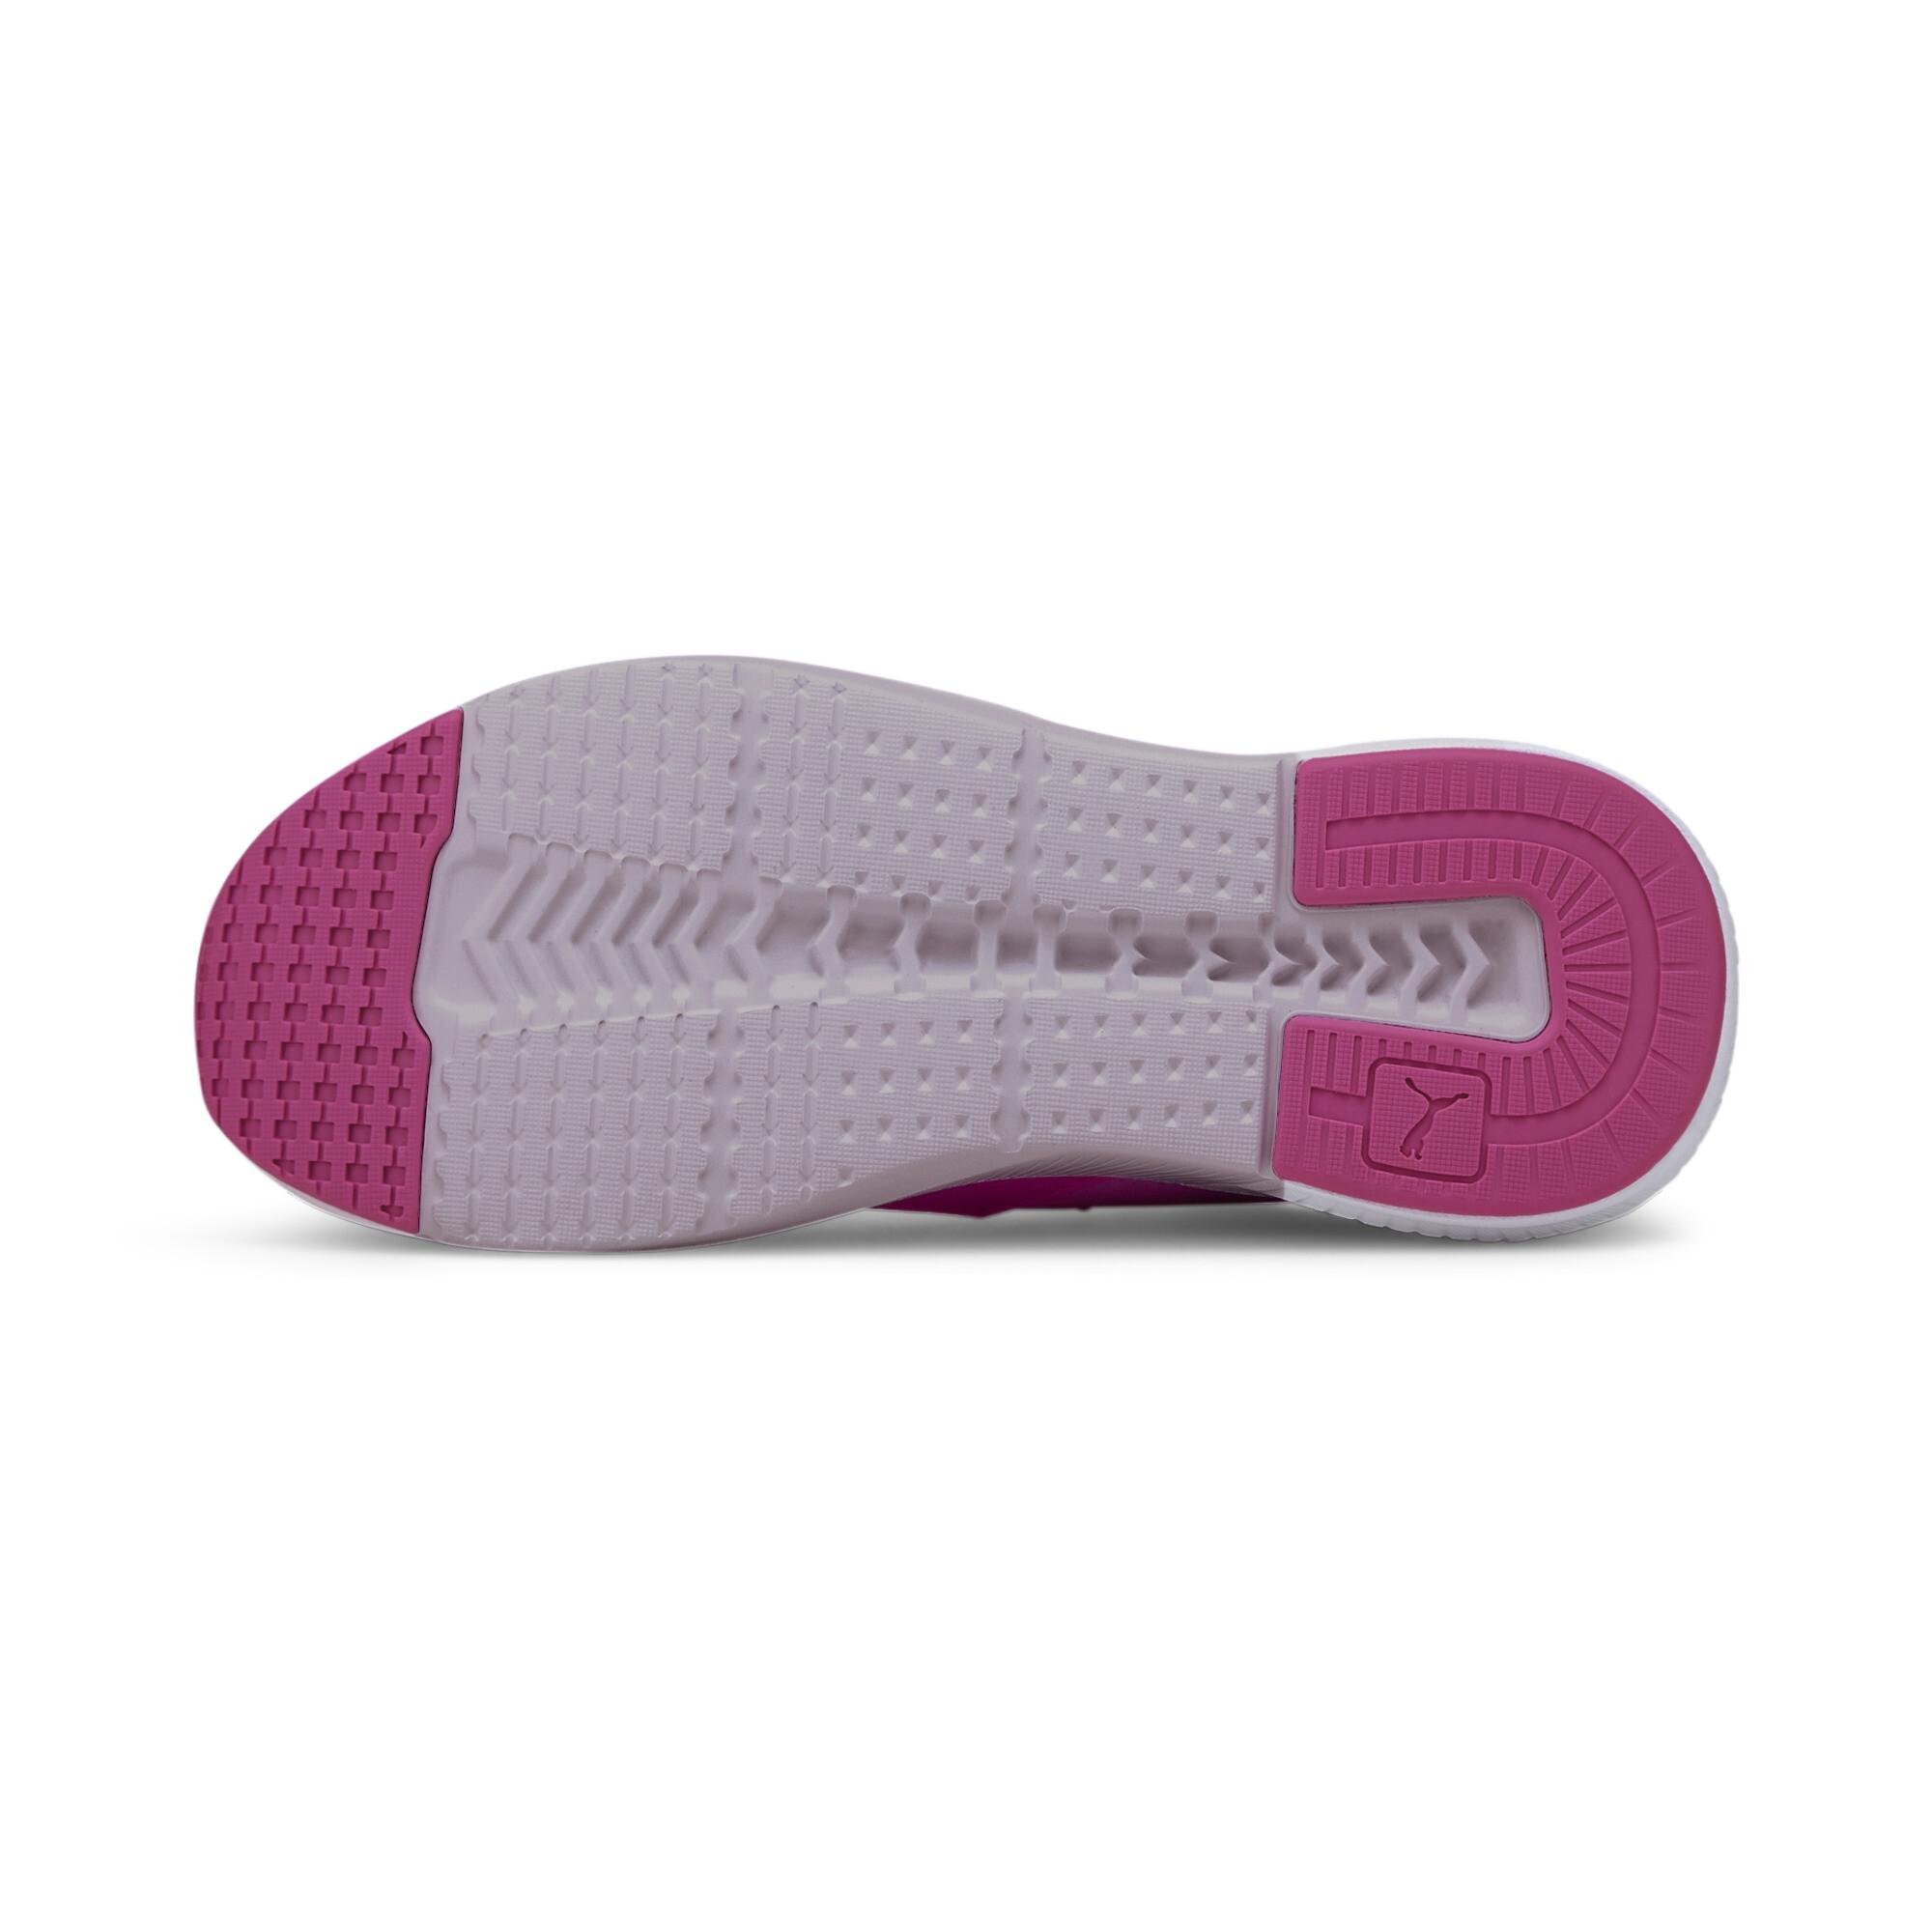 thumbnail 13 - PUMA-Women-039-s-Platinum-Training-Shoes